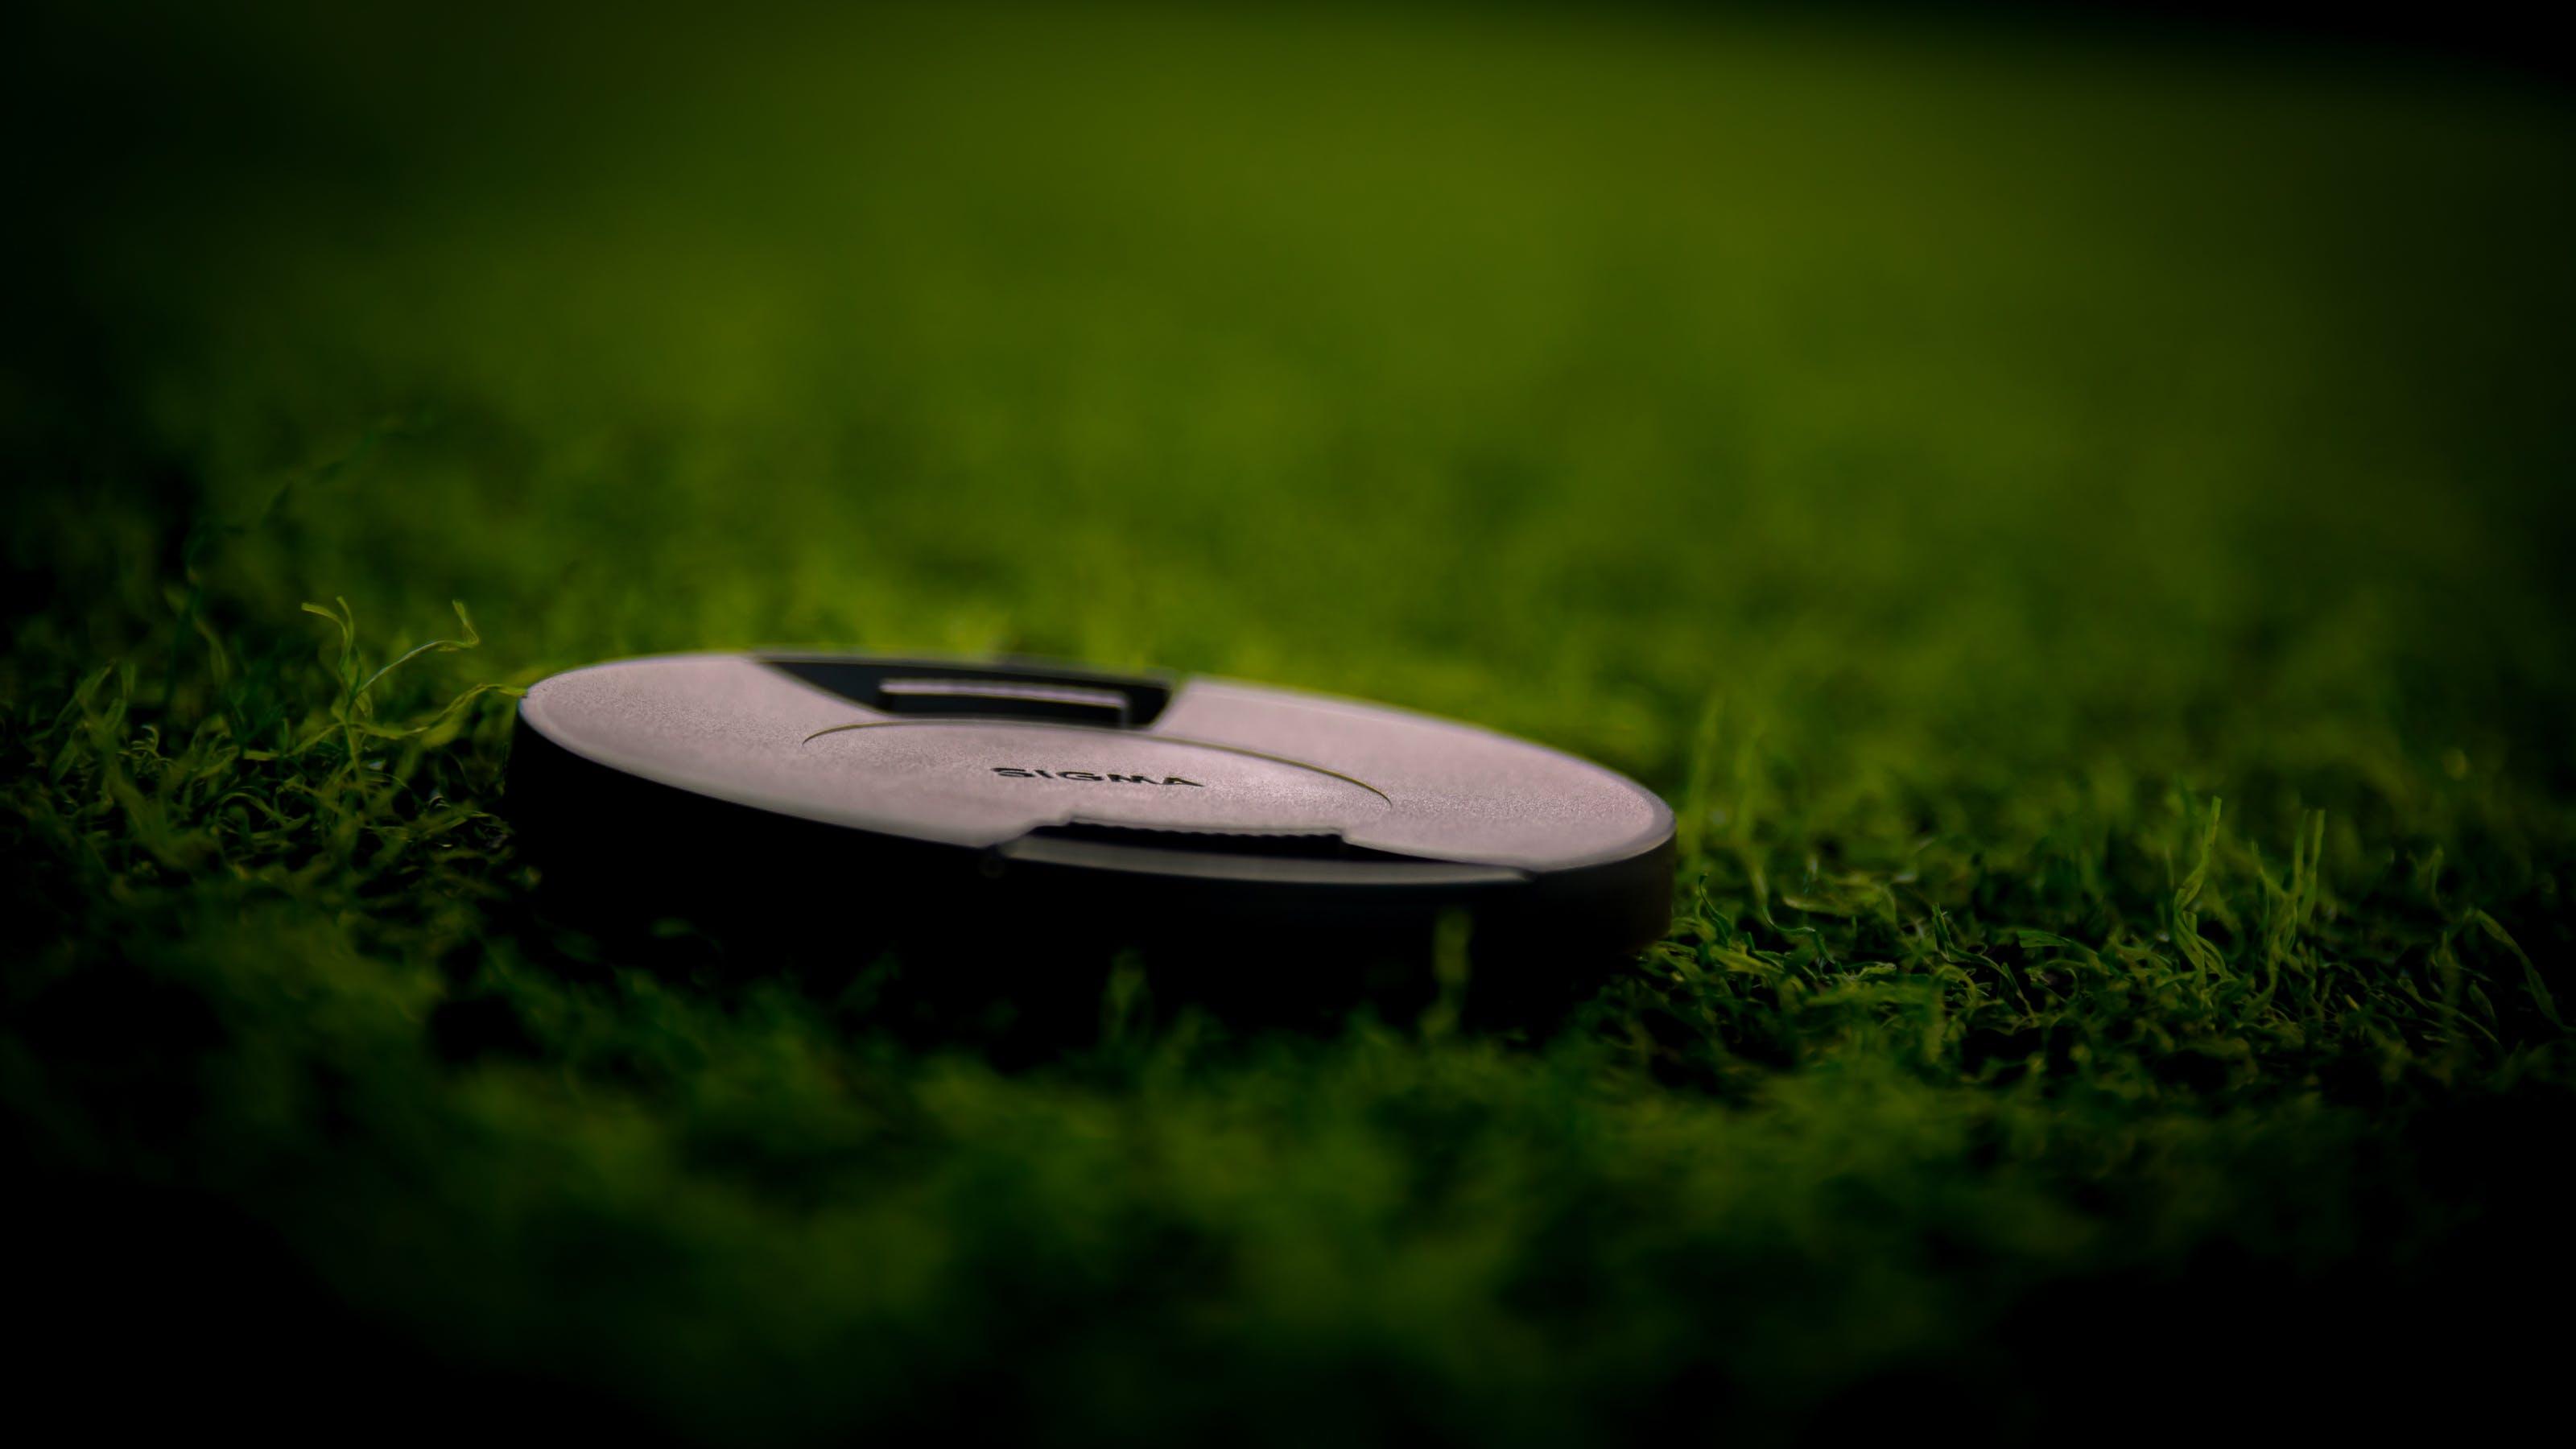 Black Camera Lens Cover on Green Grass